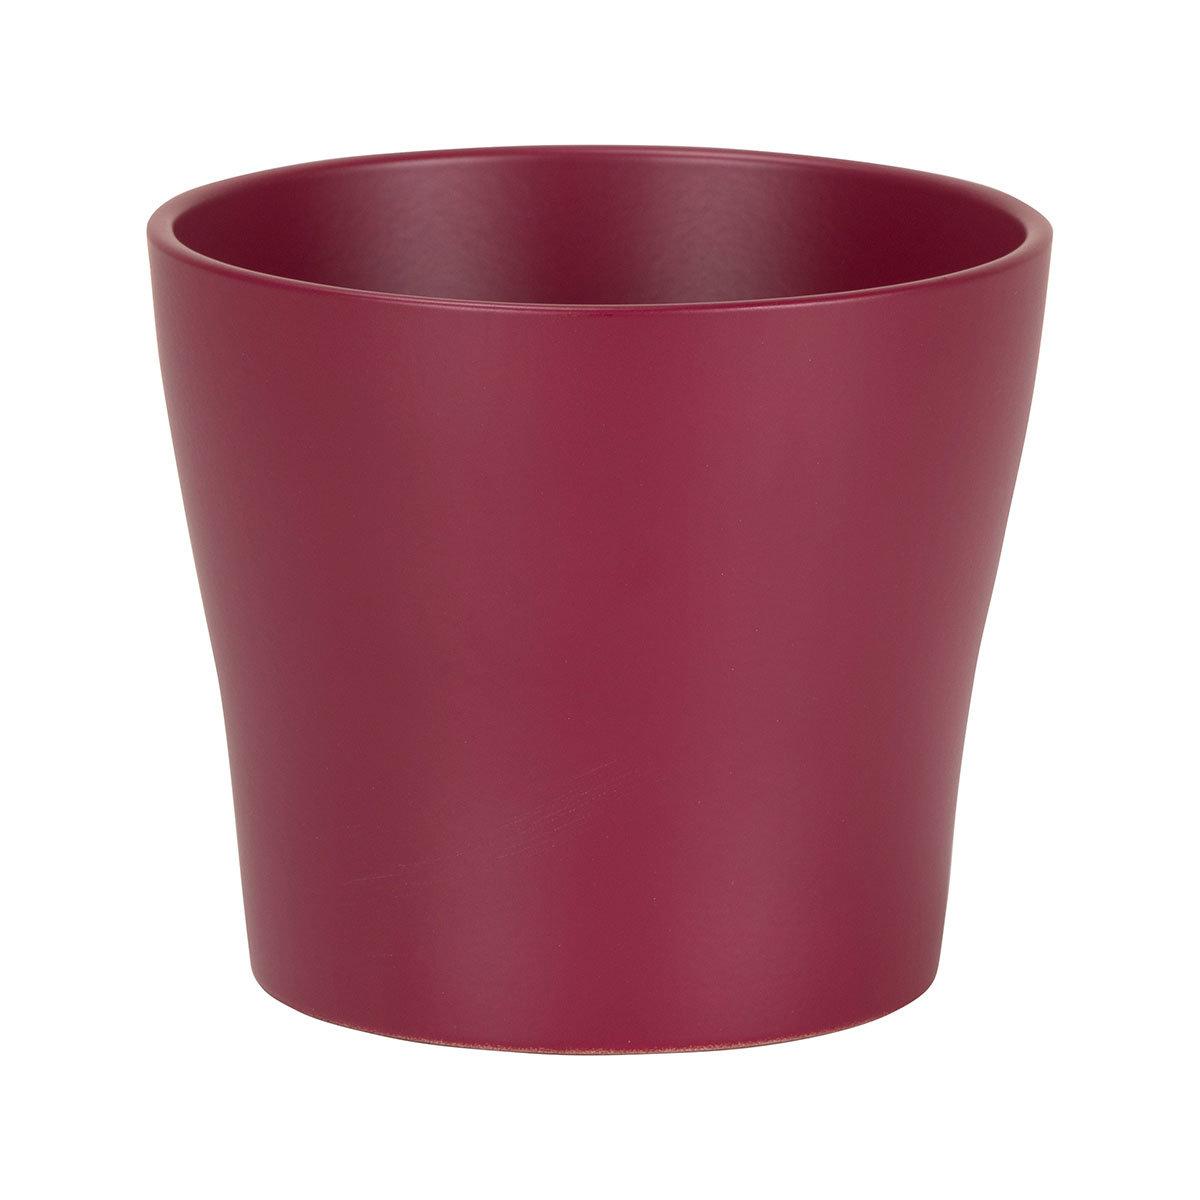 Übertopf Burgundy, 19 cm, Rot